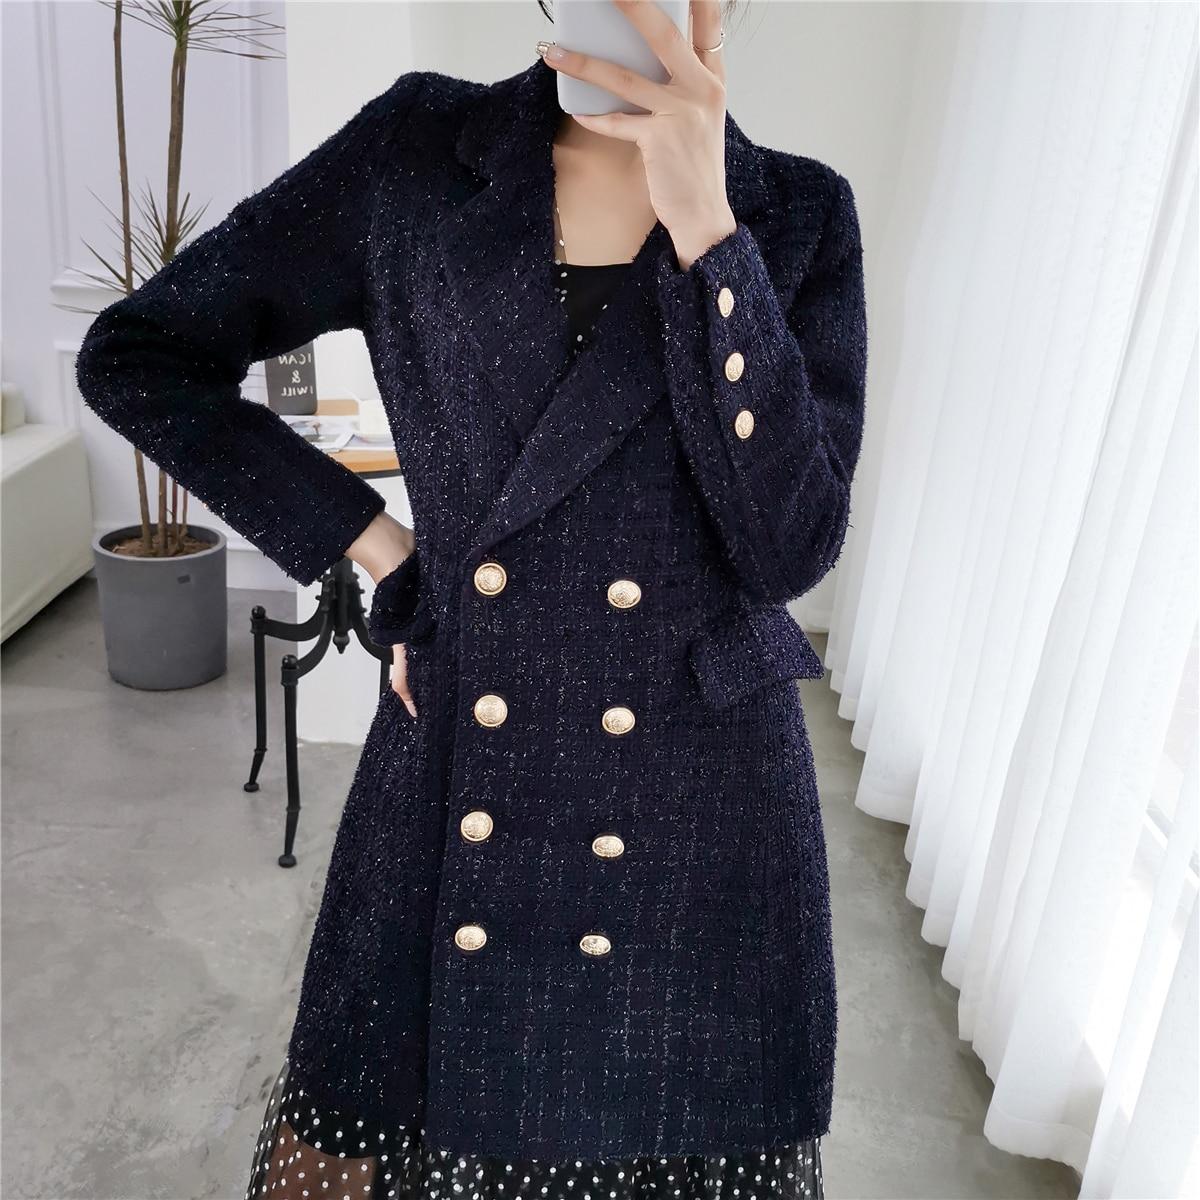 Autumn Vintage Double Breasted Woollen Tweed Blazers Coat Women 2019 Fashion Ladies Outerwear Casual Casaco Femme Plus Size 5XL